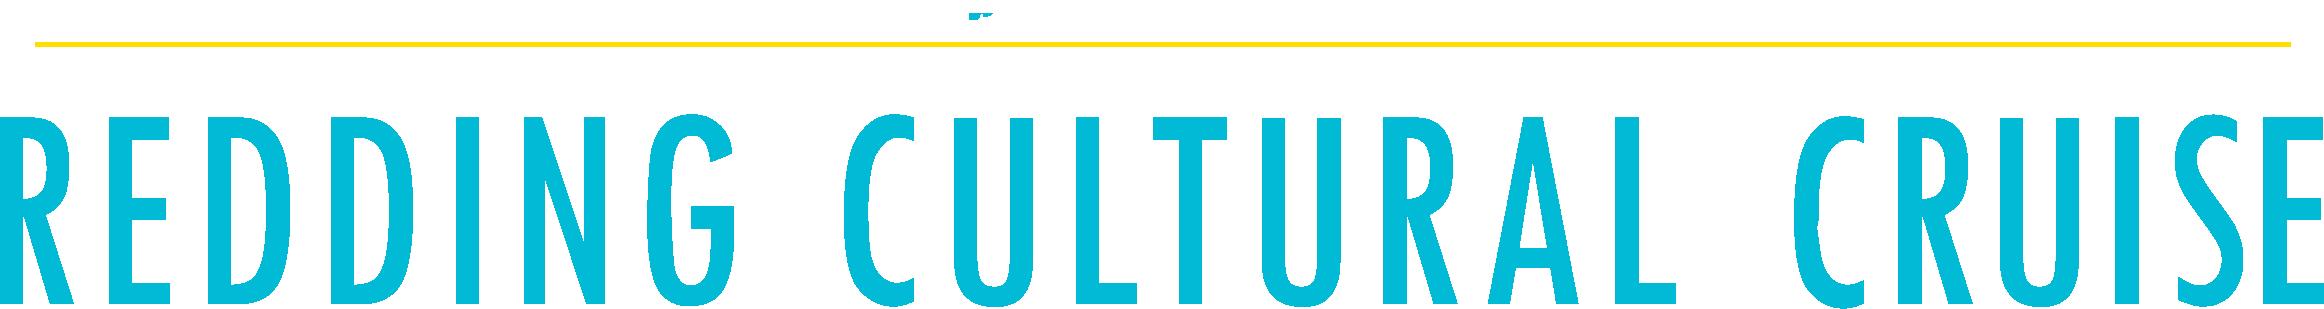 Redding Cultural Cruise